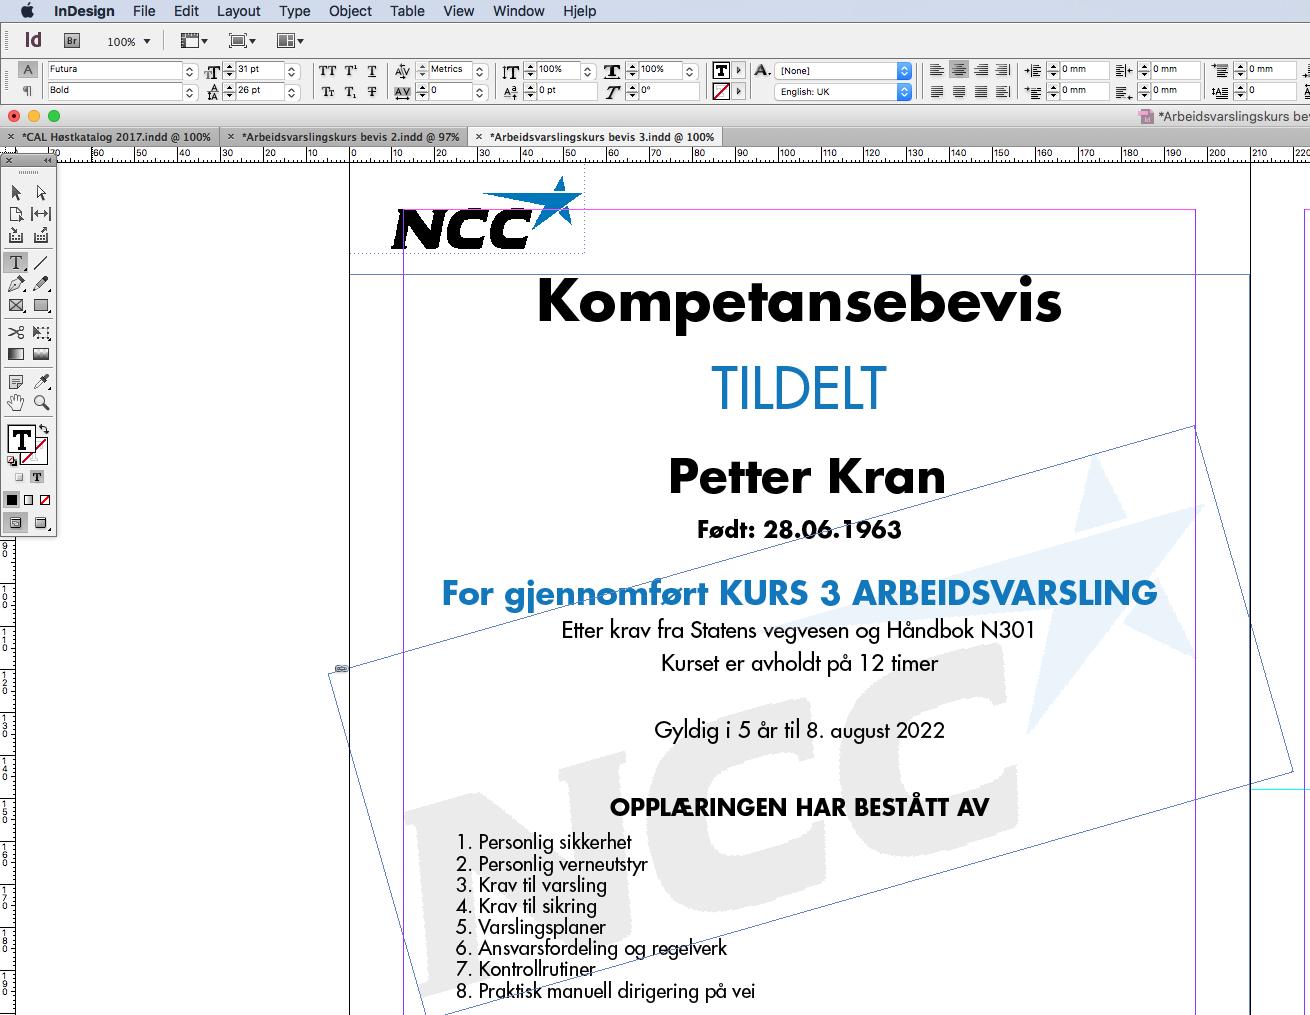 NCC Roads AS, Kompetansebevis